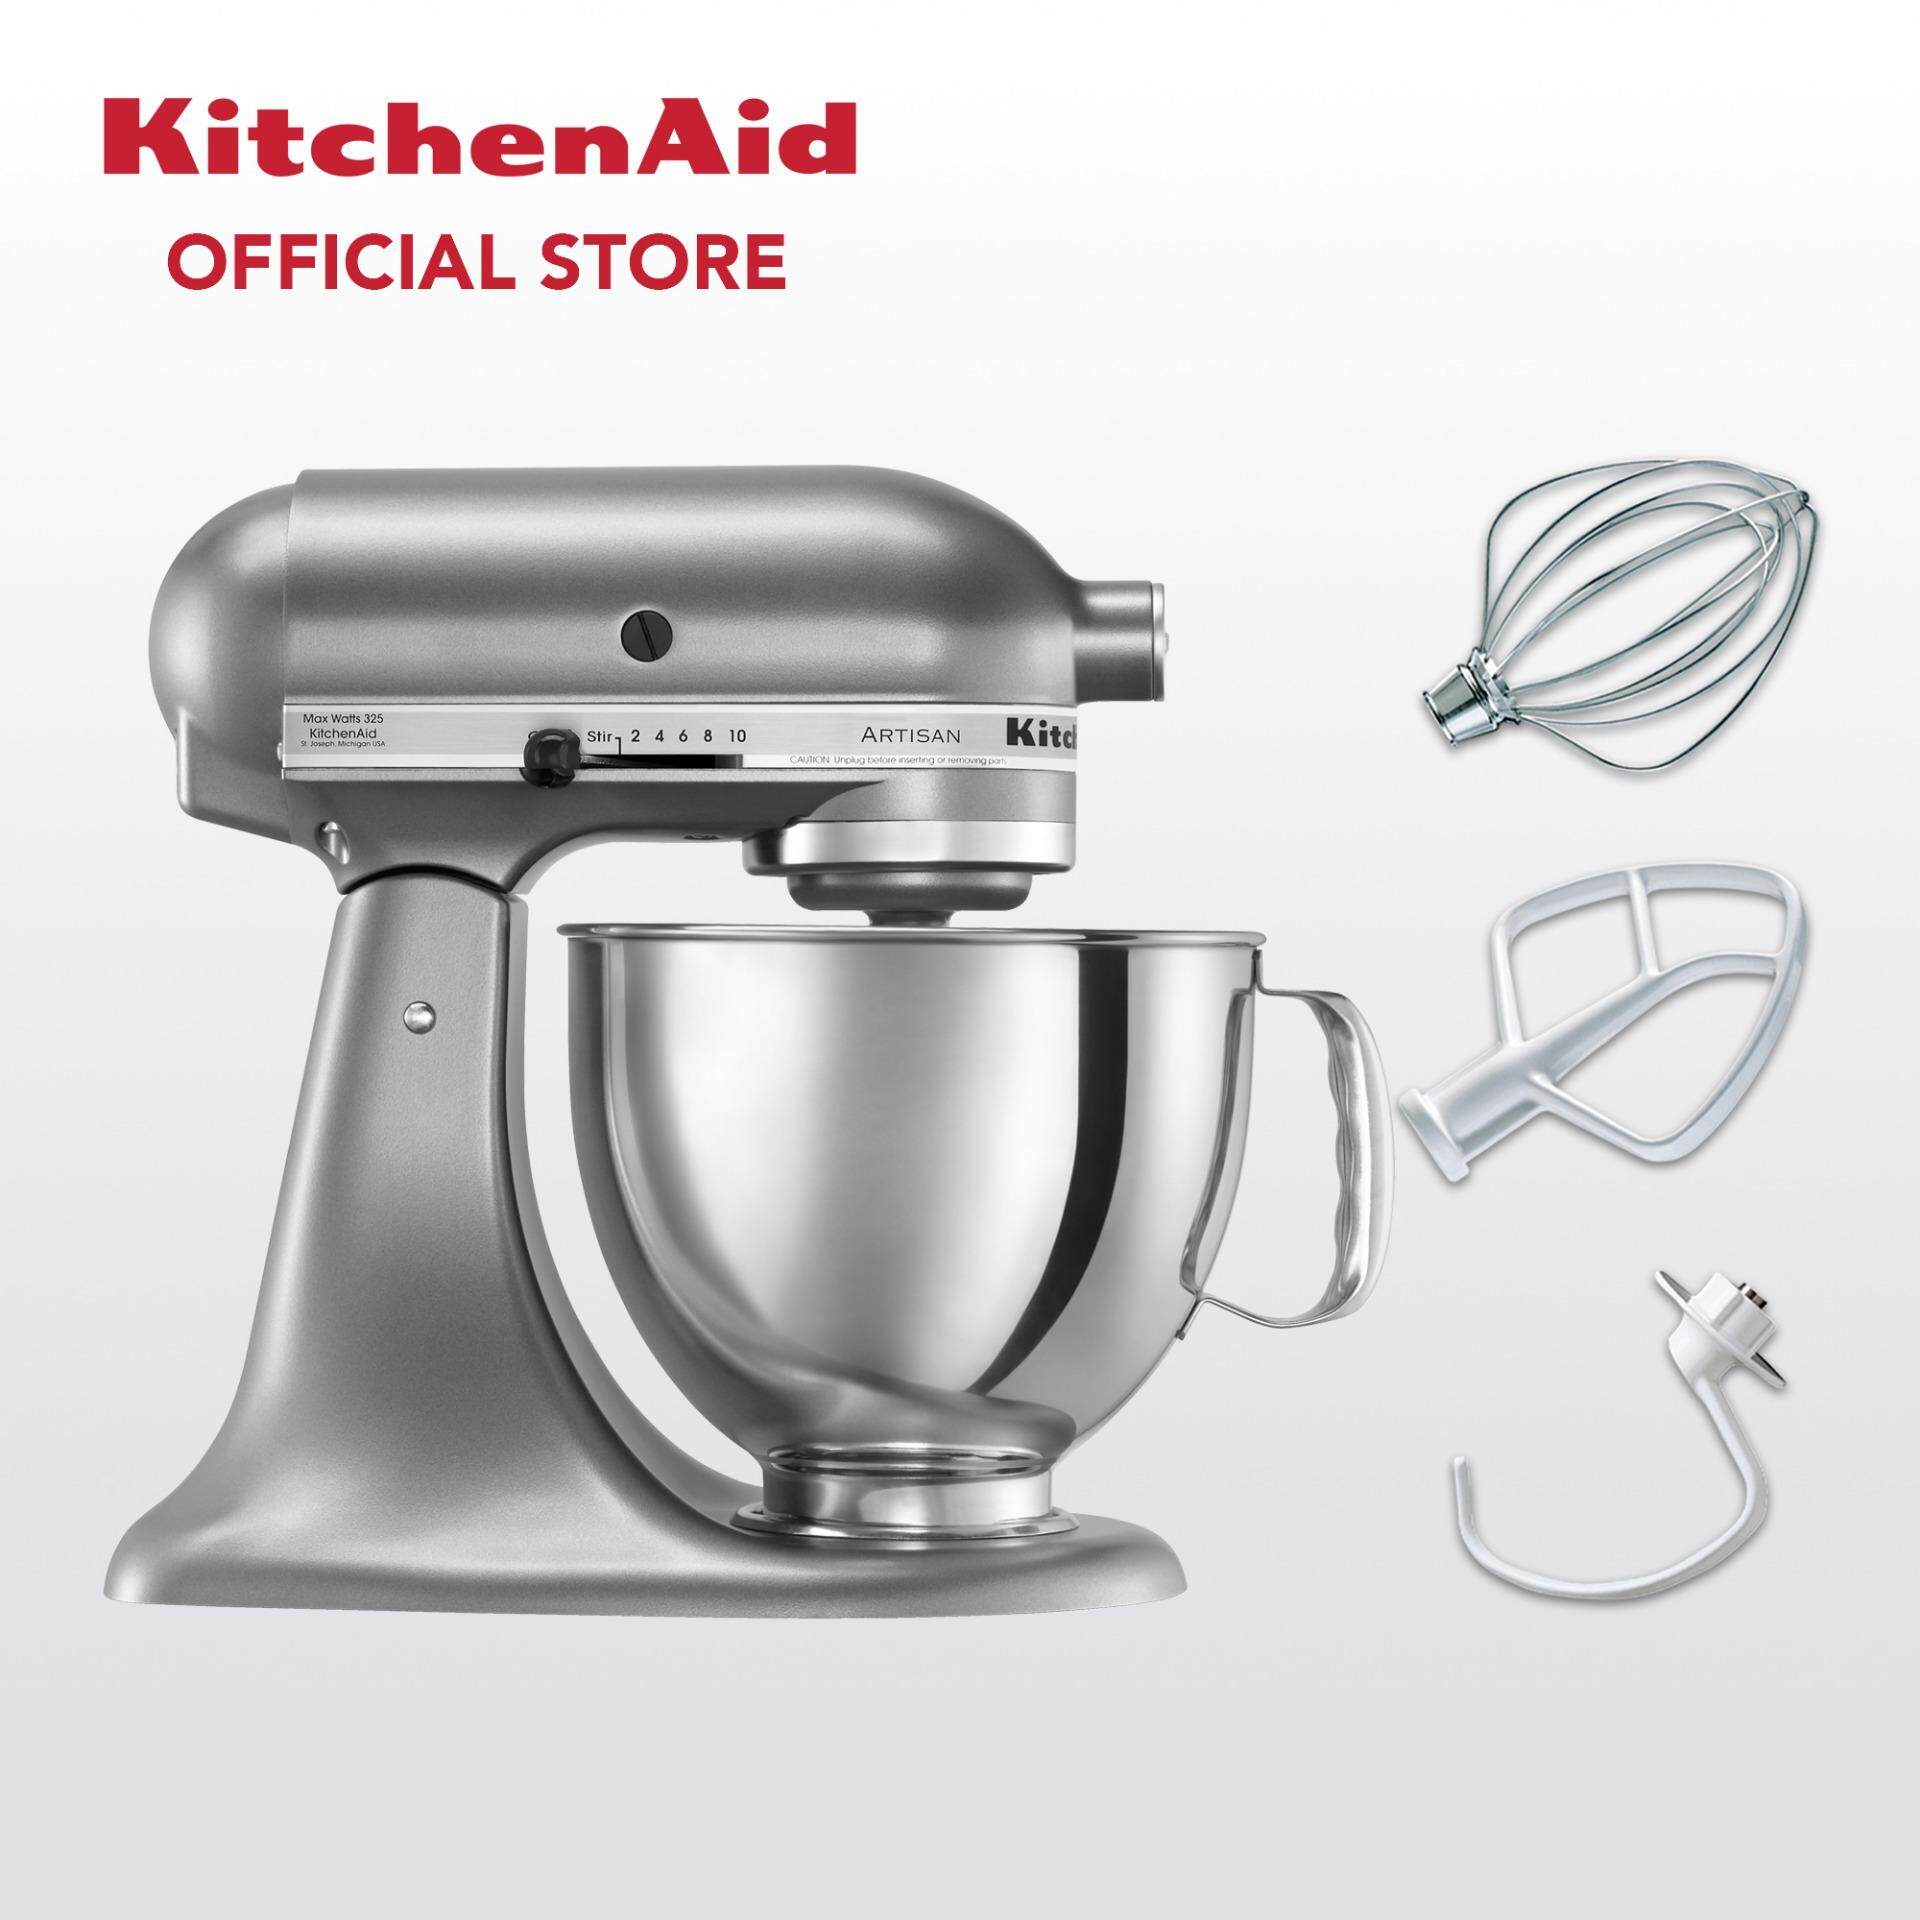 Kitchenaid Artisan 4 8 L Tilt Head Stand Mixer 5ksm125 Contour Silver